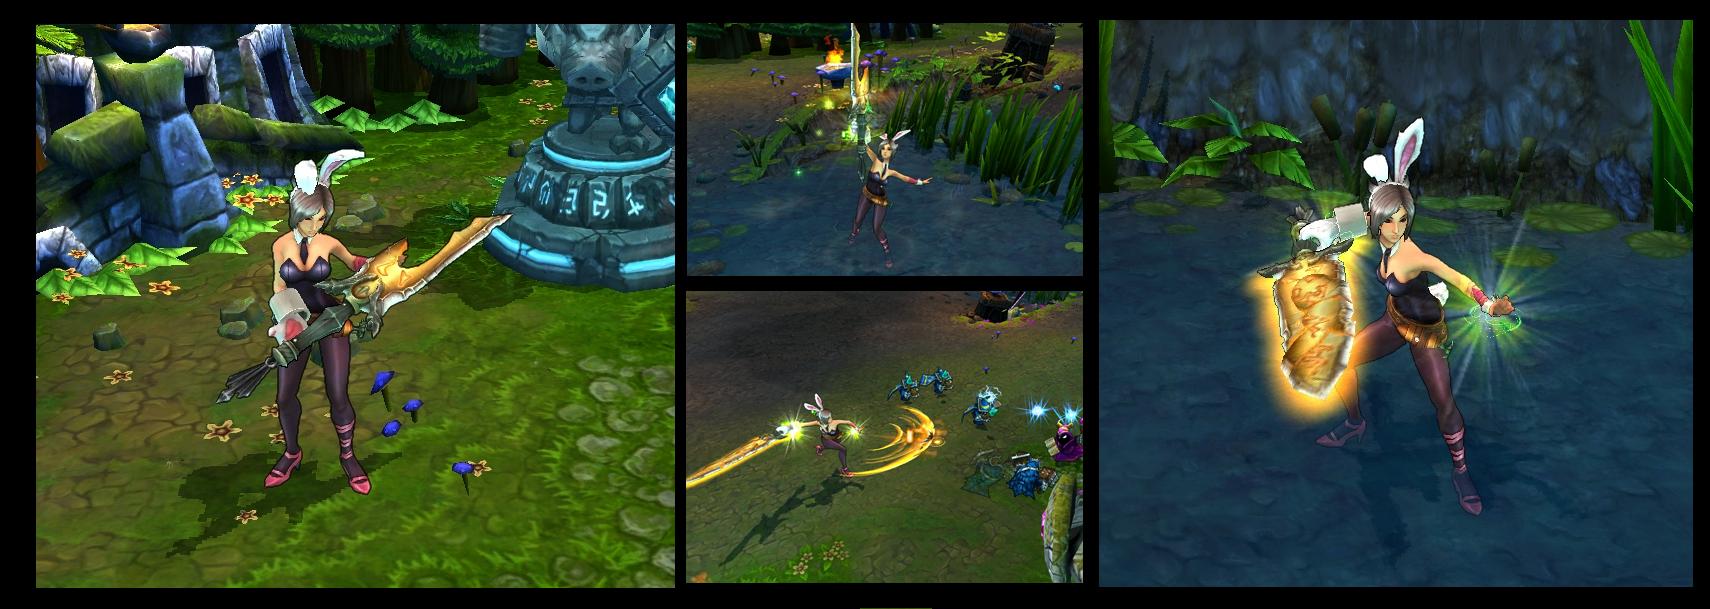 Riven BattleBunny Screenshots.jpg